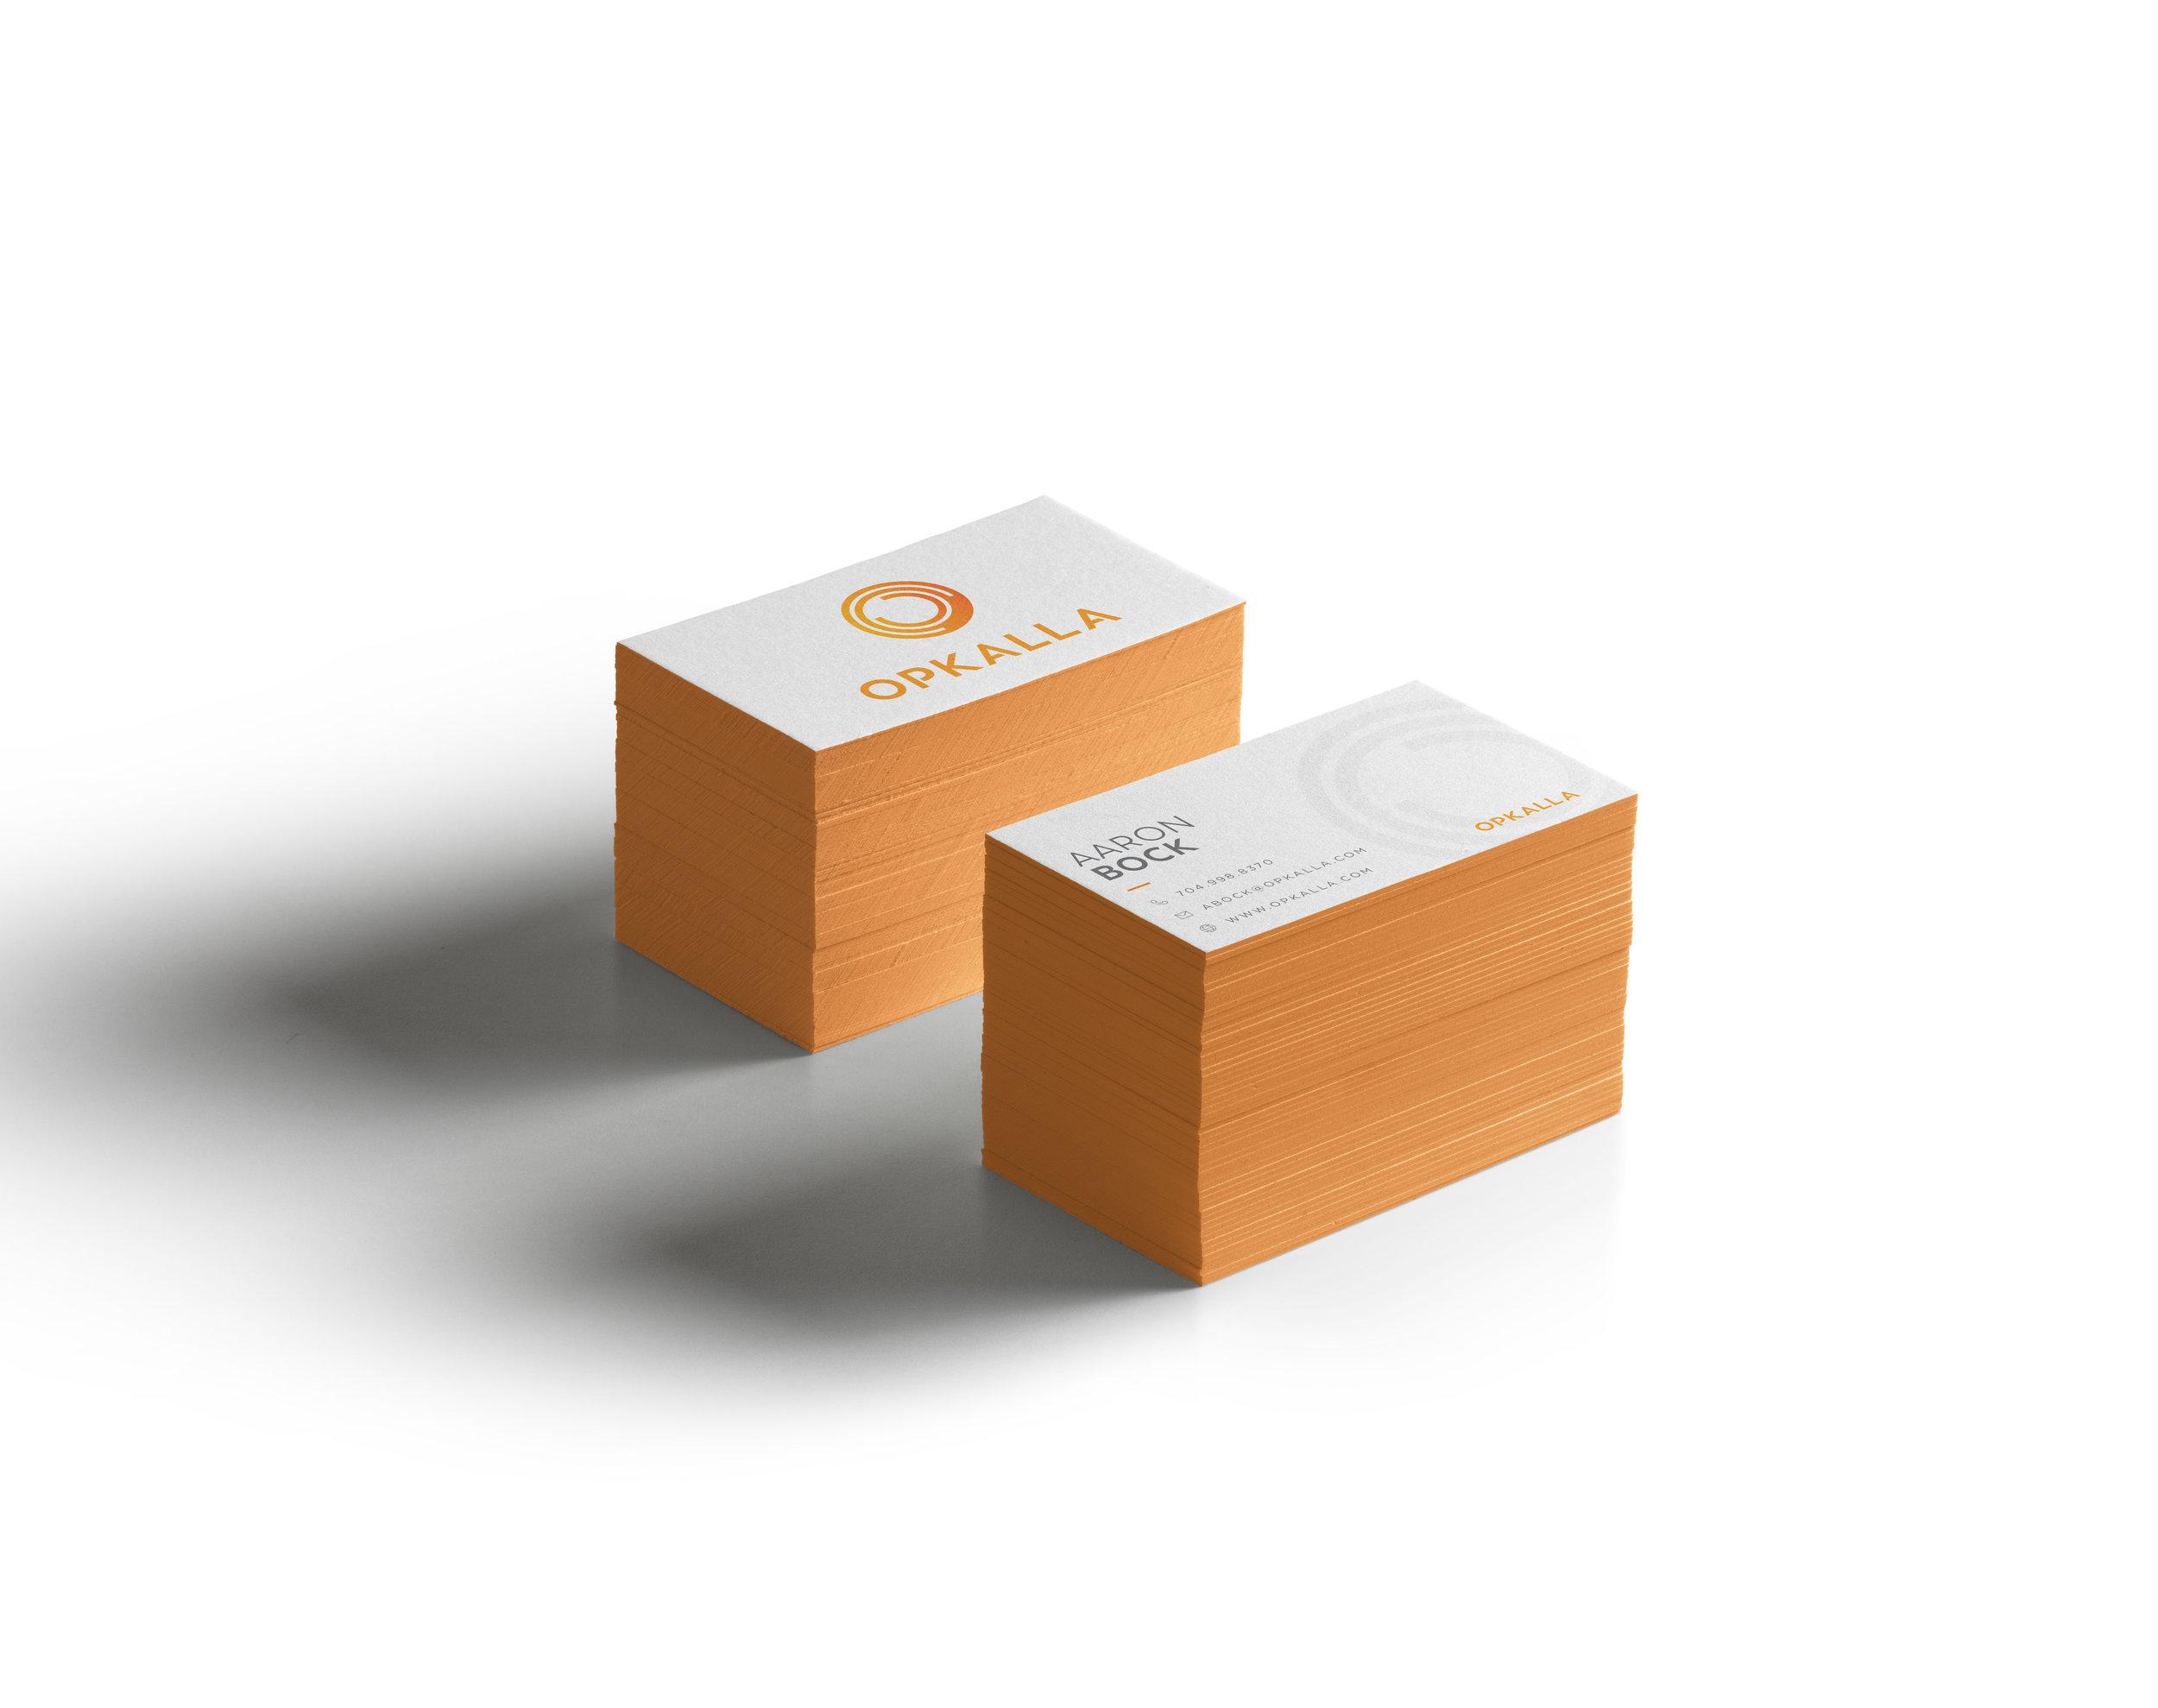 Business-Card-Brand-Mockup-Vol5.jpg